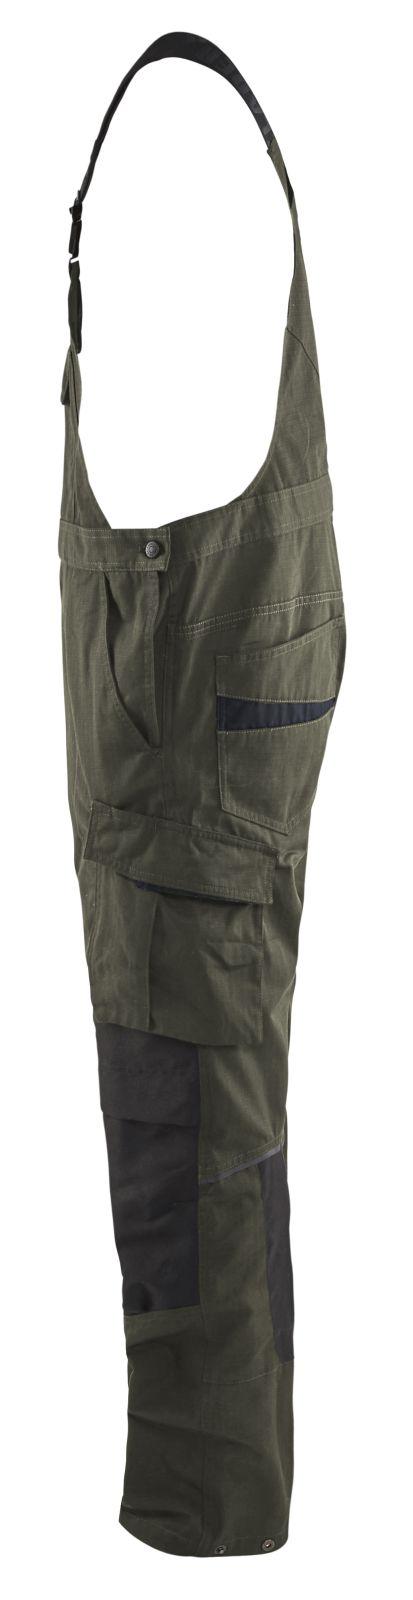 Blaklader Amerikaanse overalls 26951330 met Stretch groen-zwart(4599)